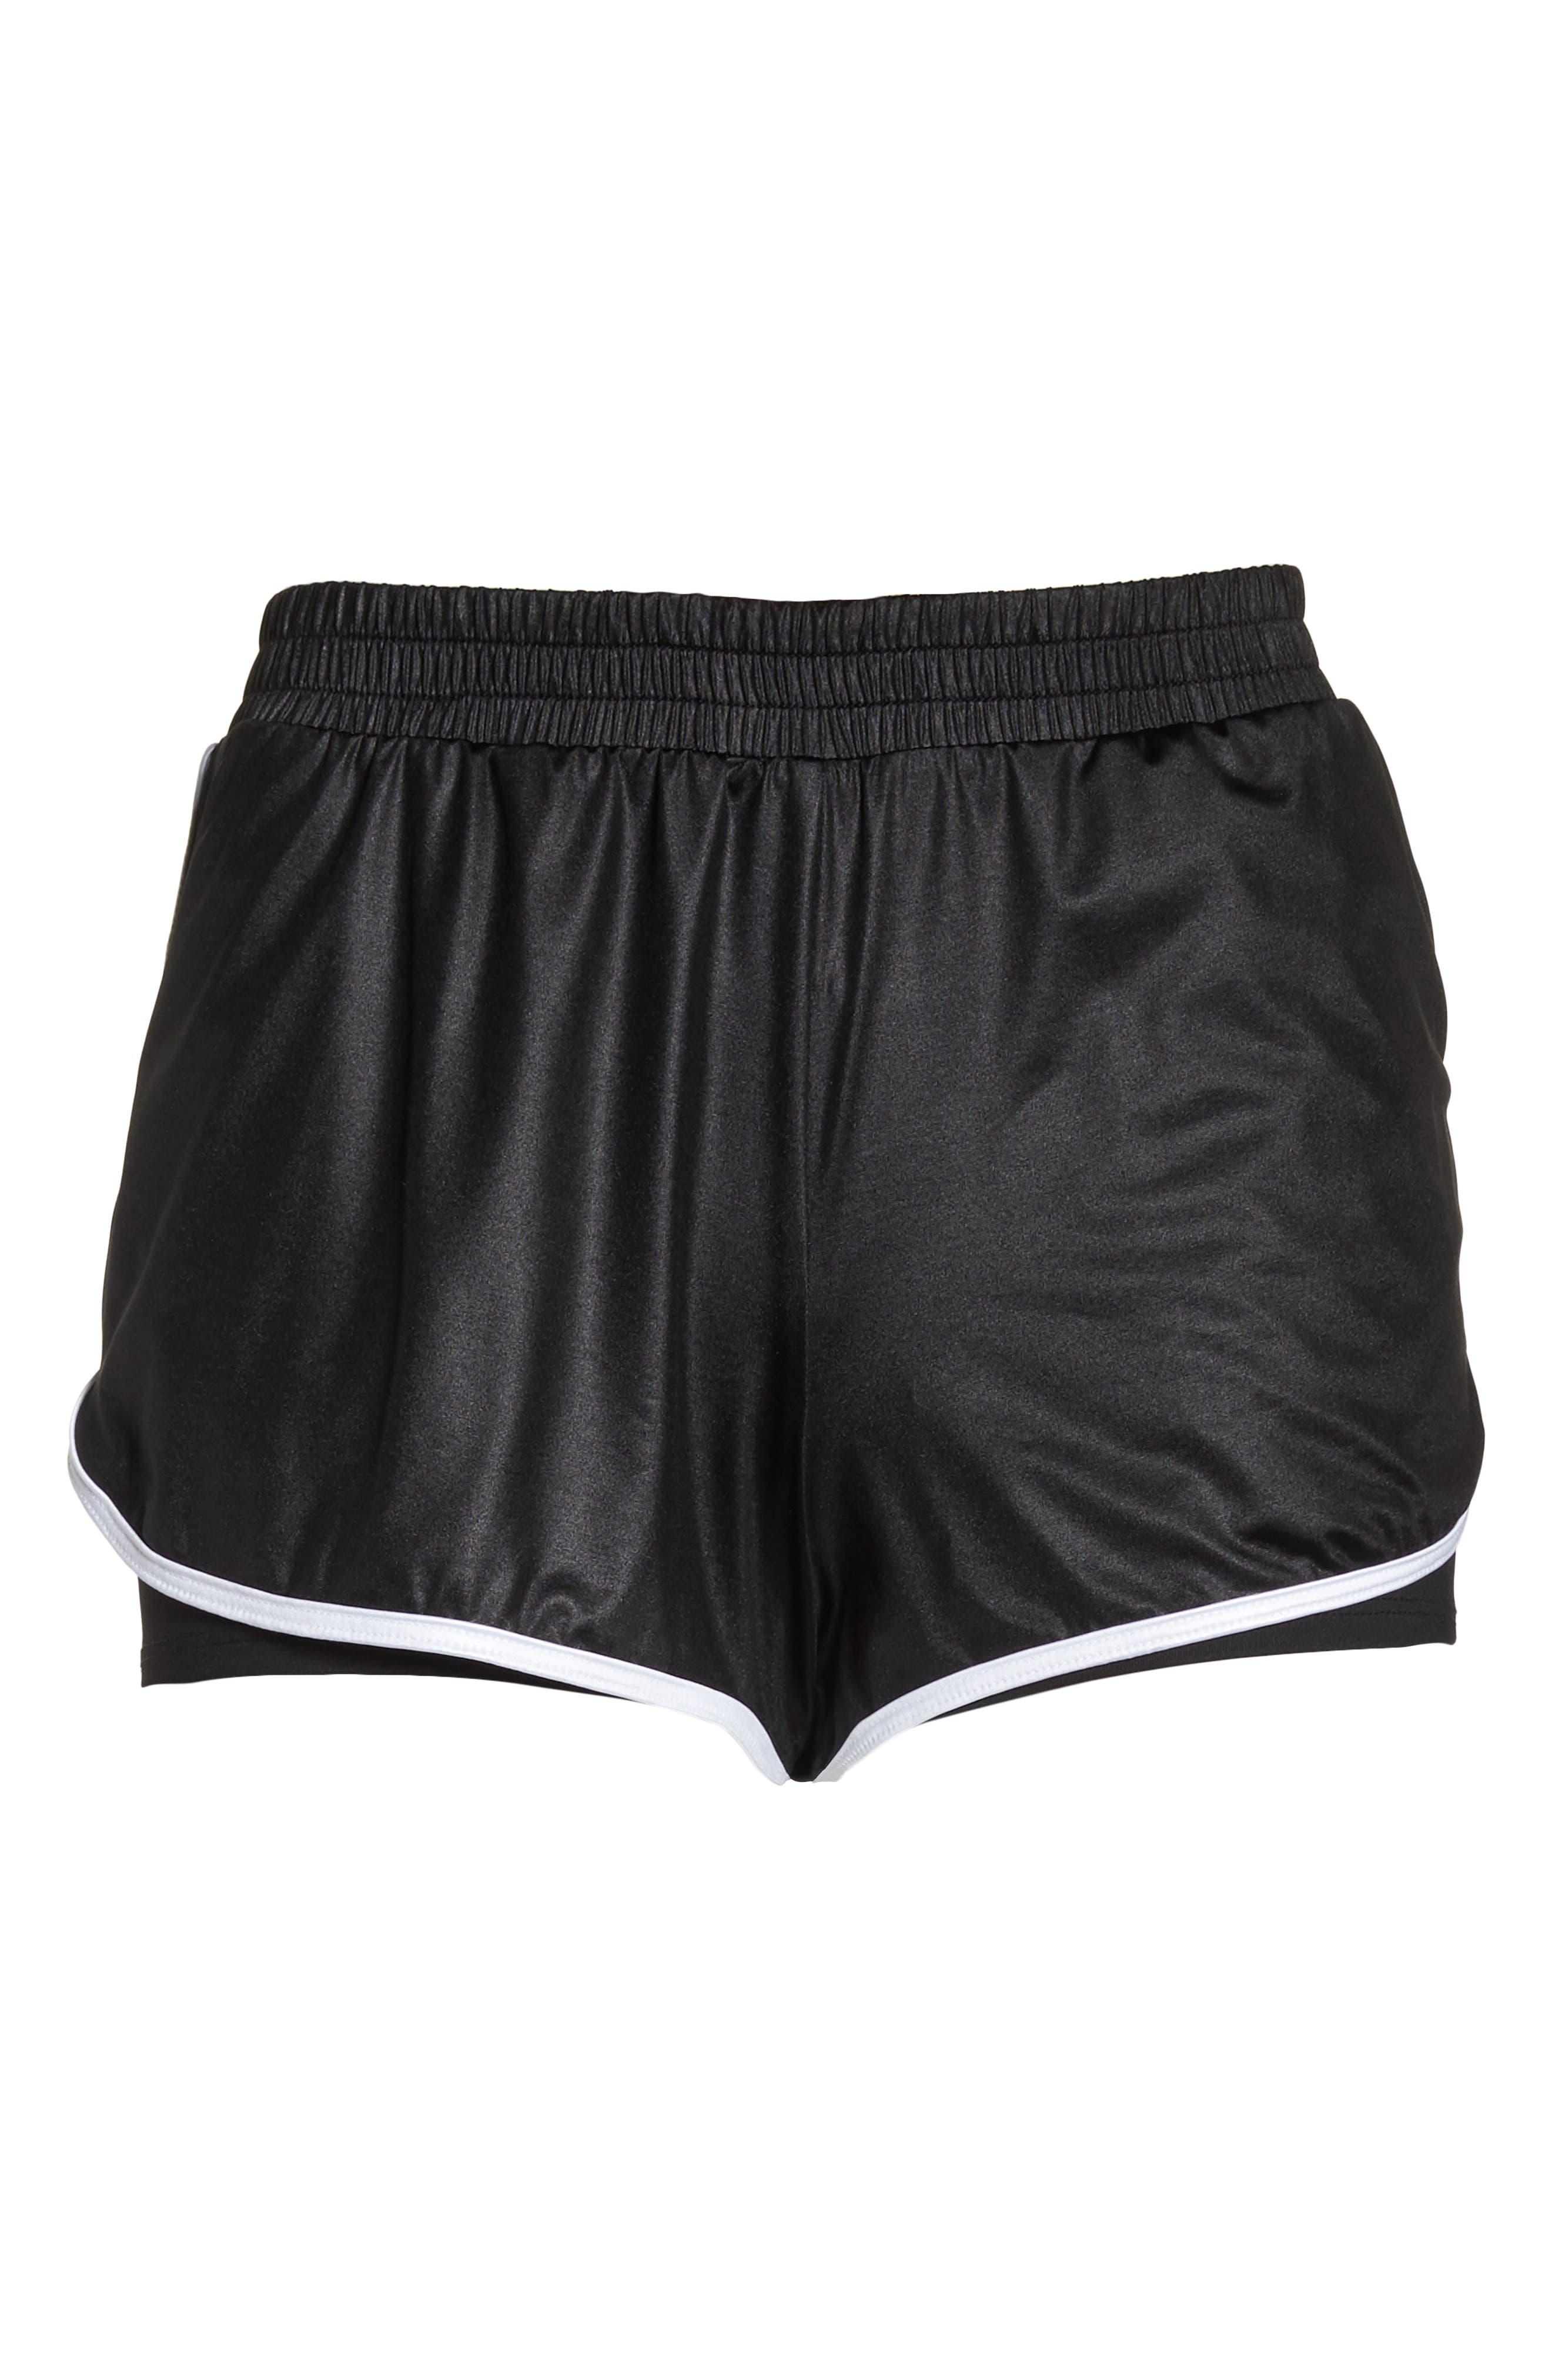 Scout Gym Shorts,                             Alternate thumbnail 7, color,                             BLACK/ WHITE